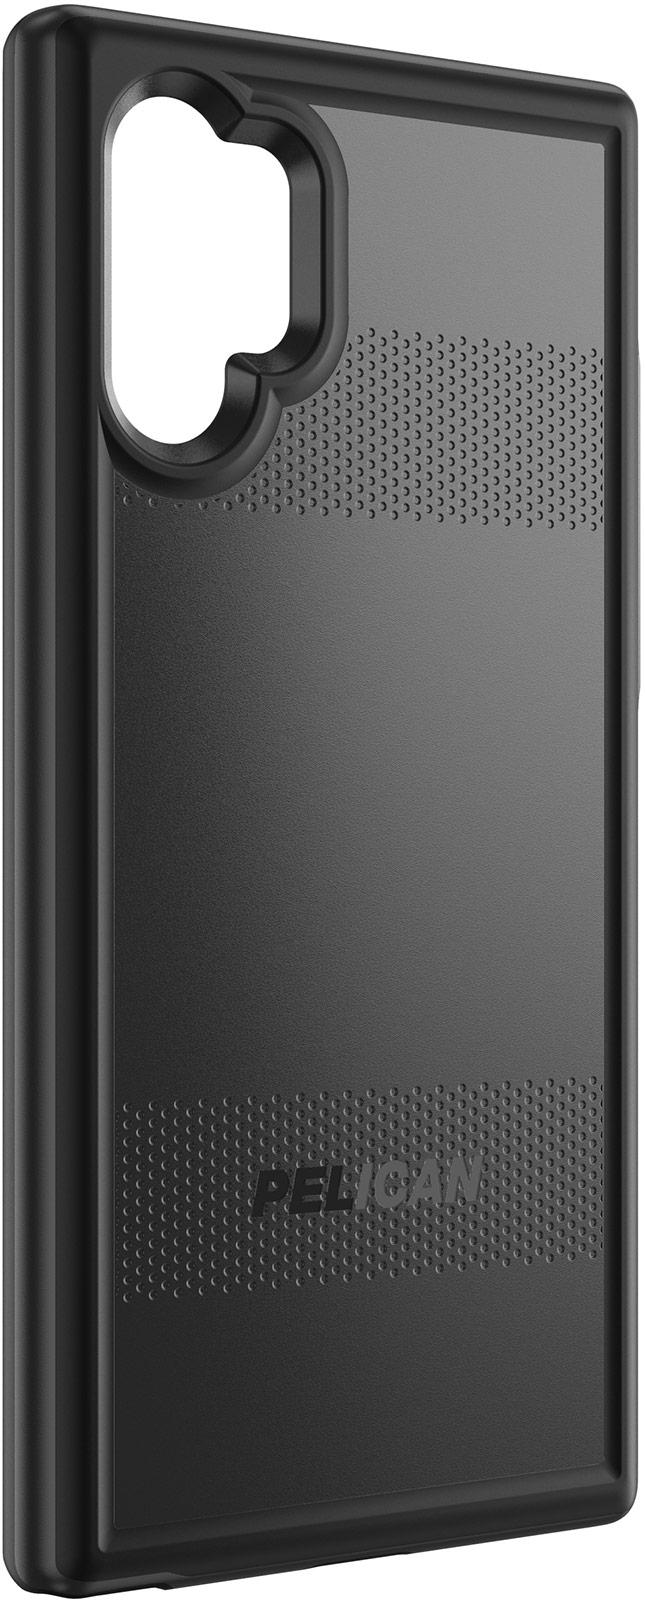 pelican galaxy note 10 plus protector black tough phone case